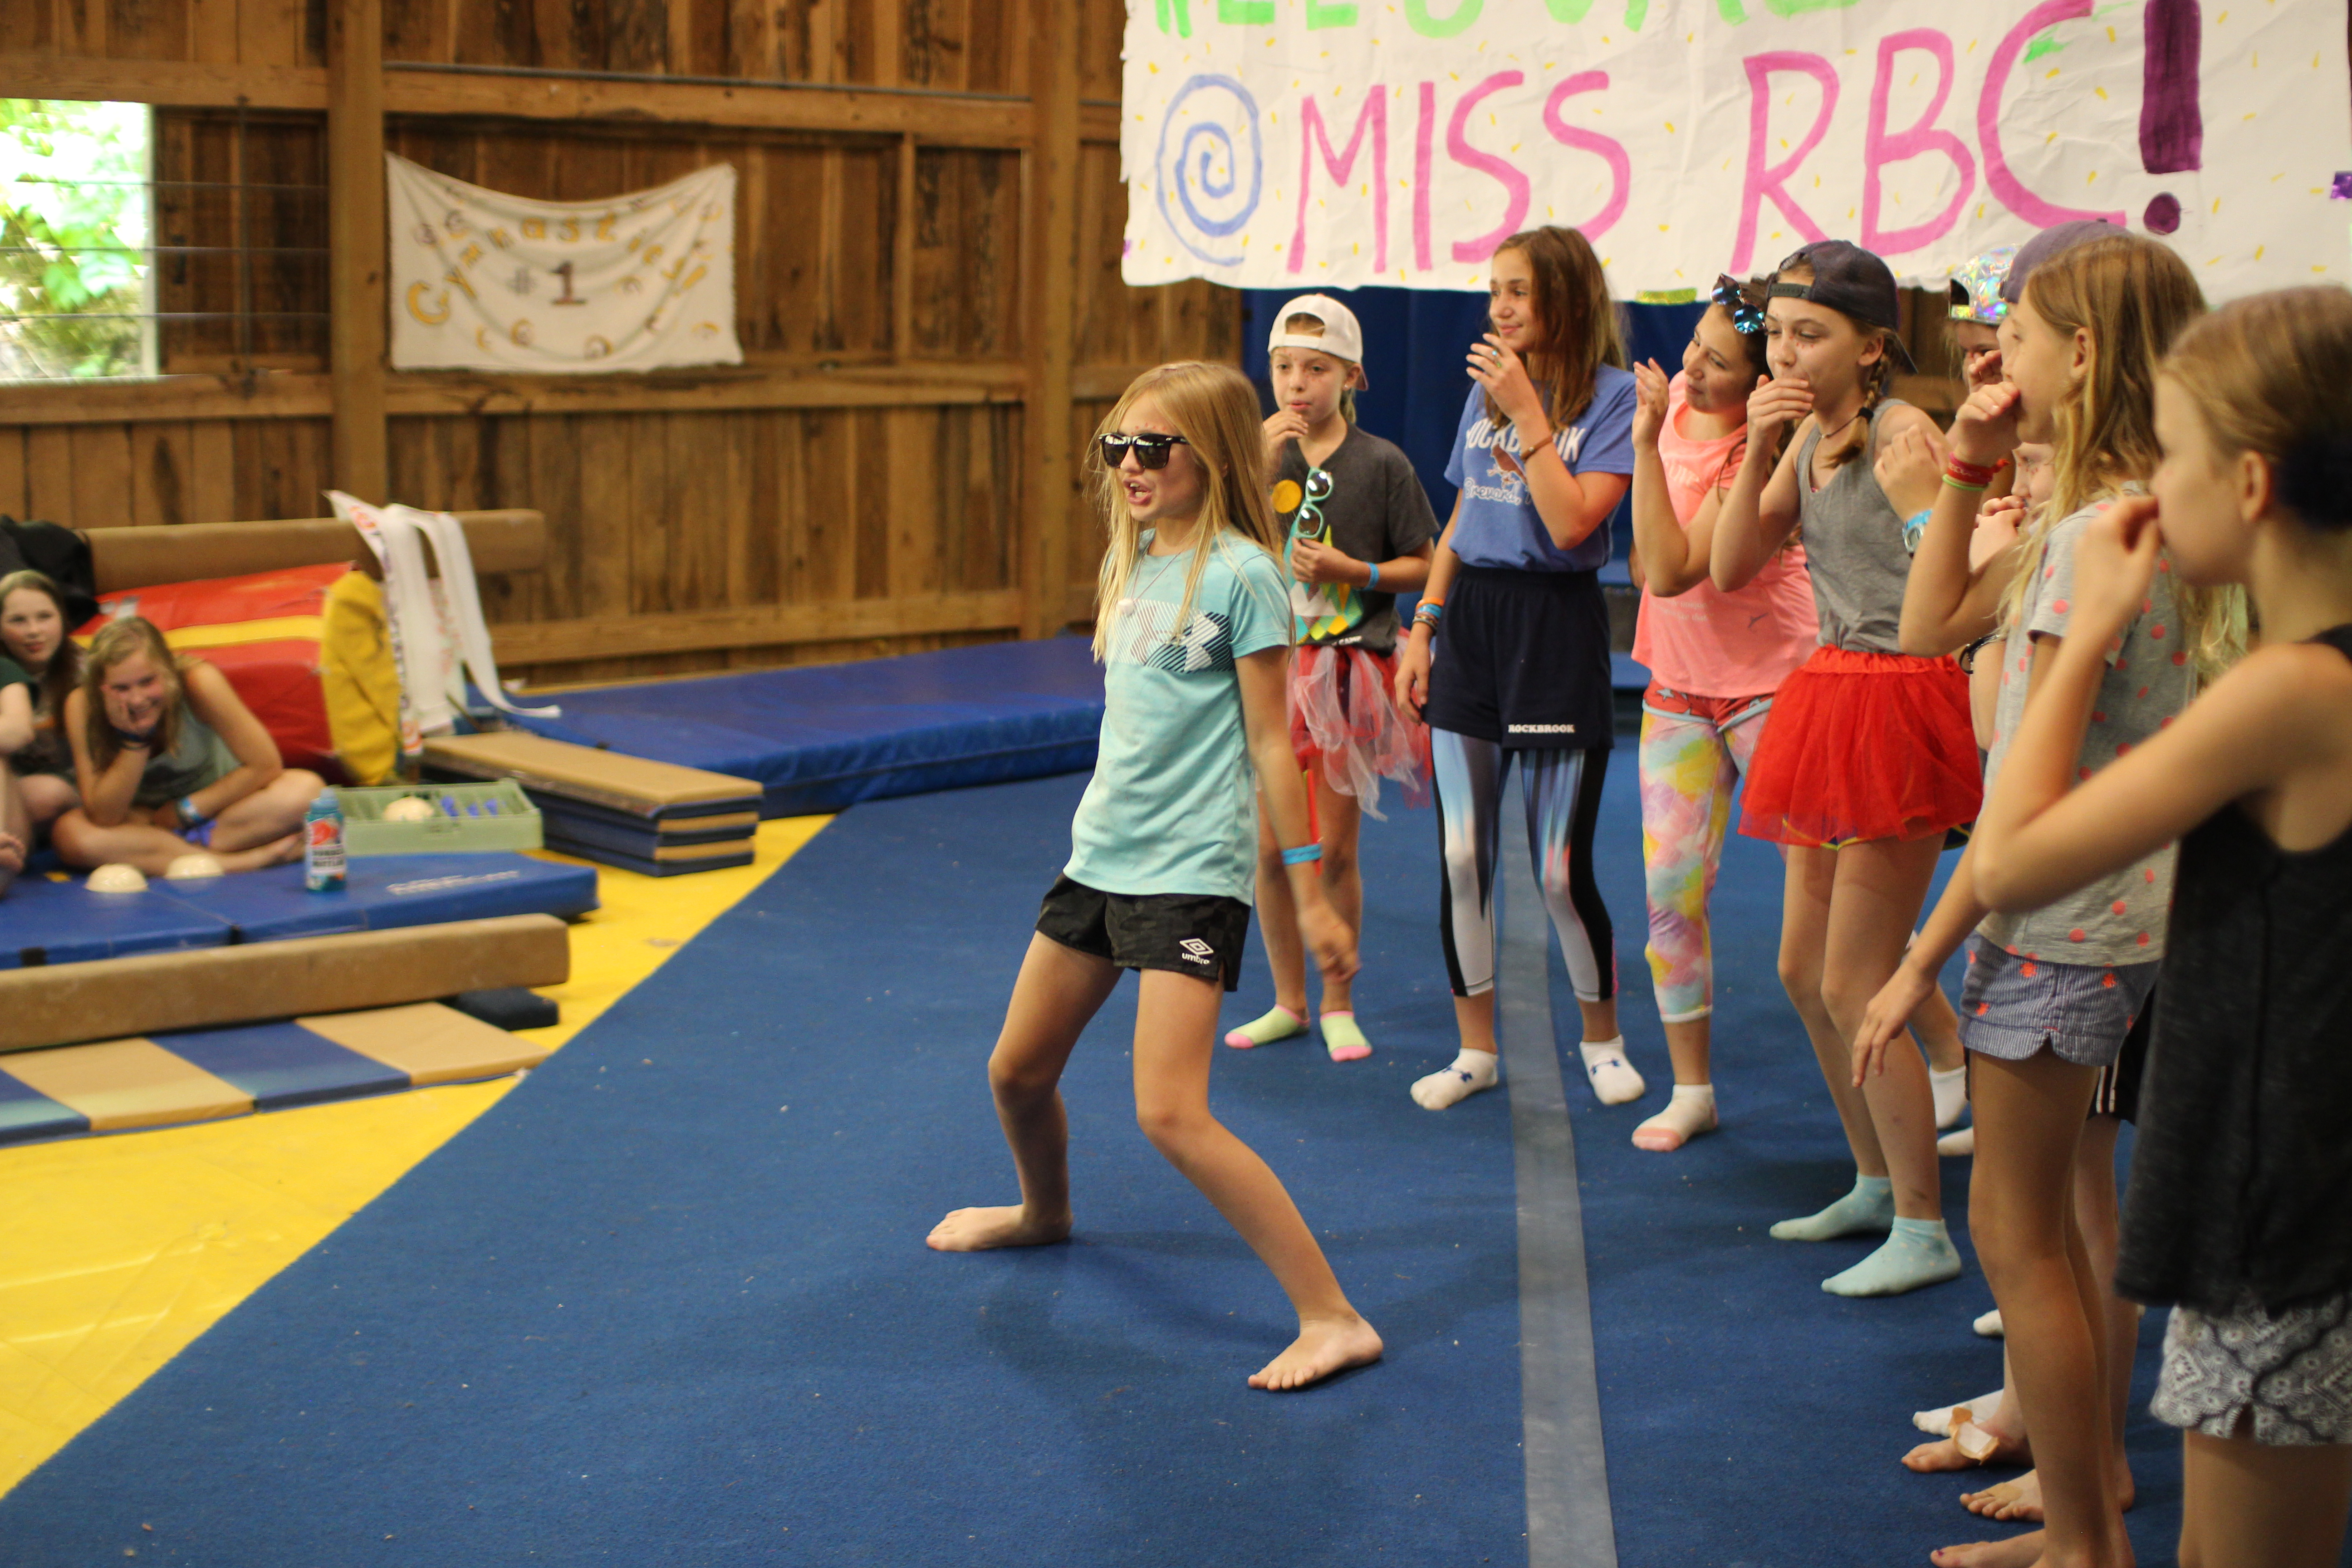 skit performance of girls cooperating